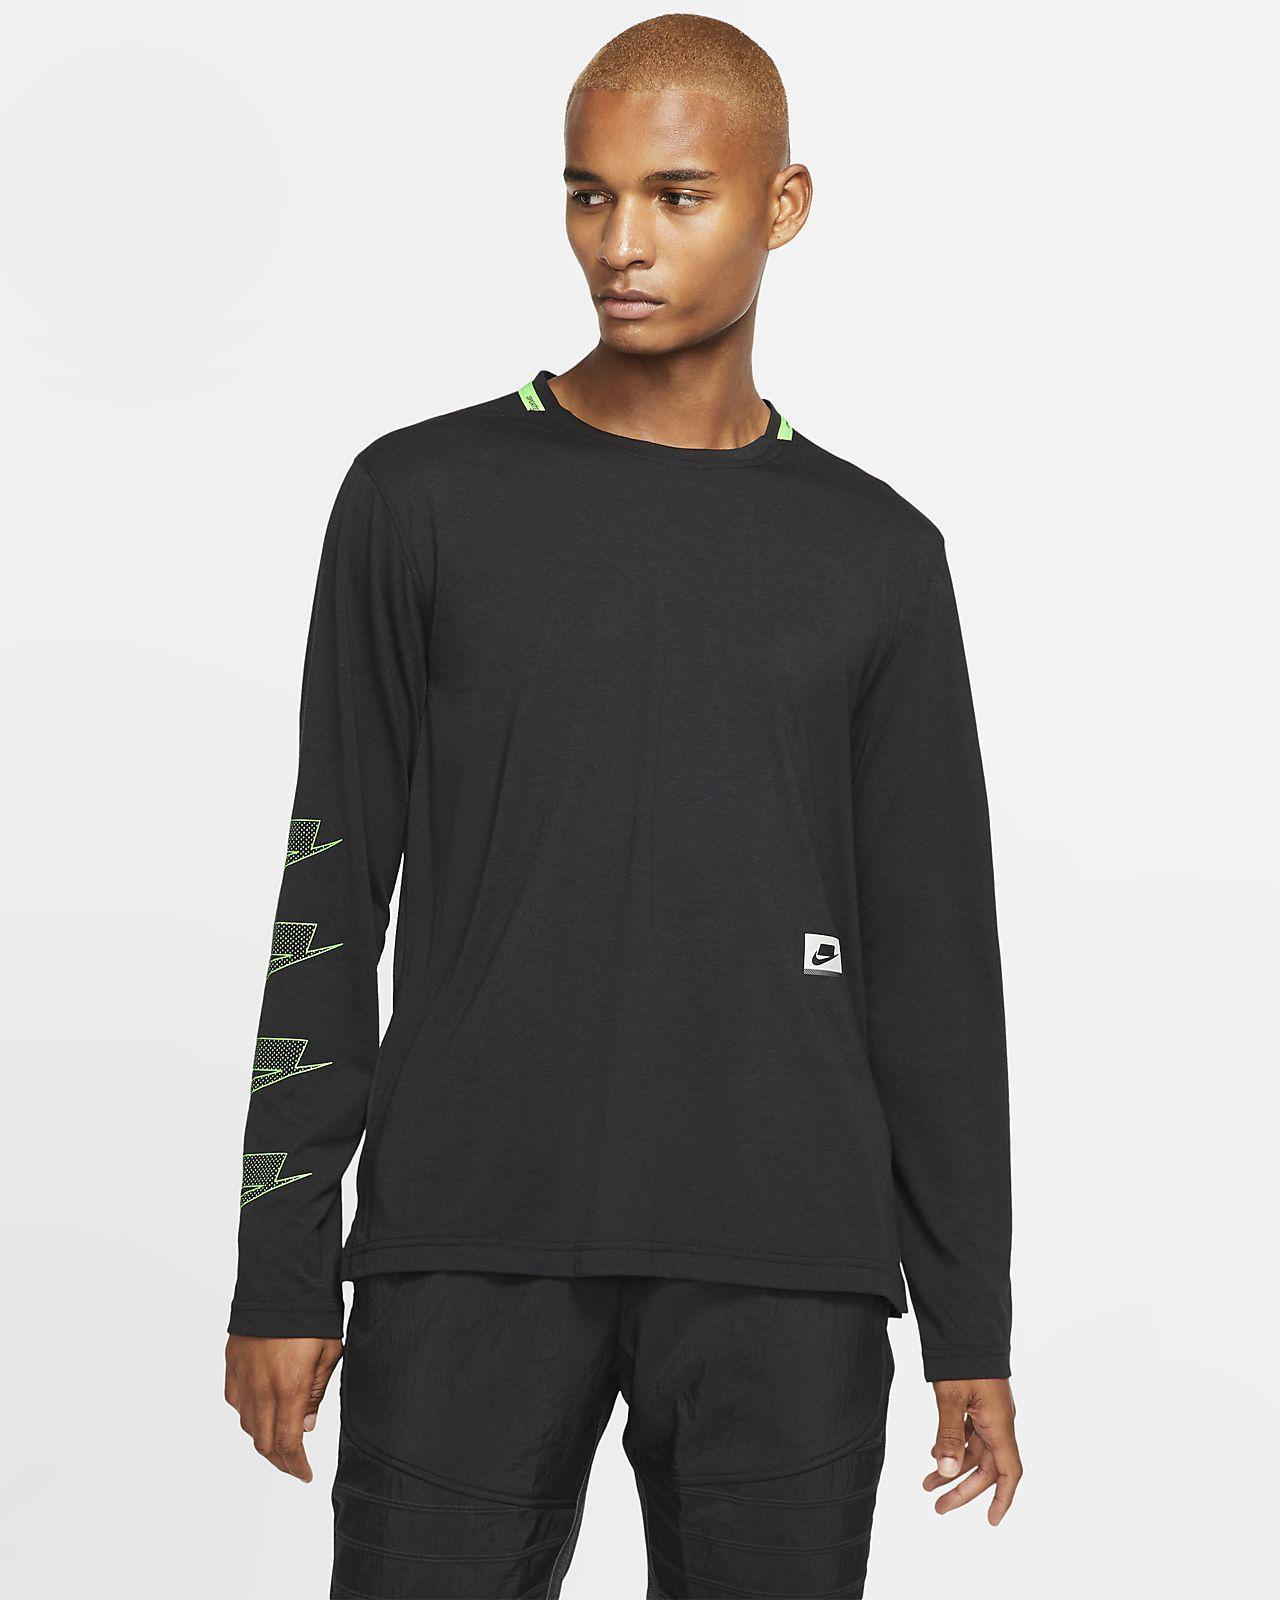 Nike Dri-FIT 男子长袖训练上衣